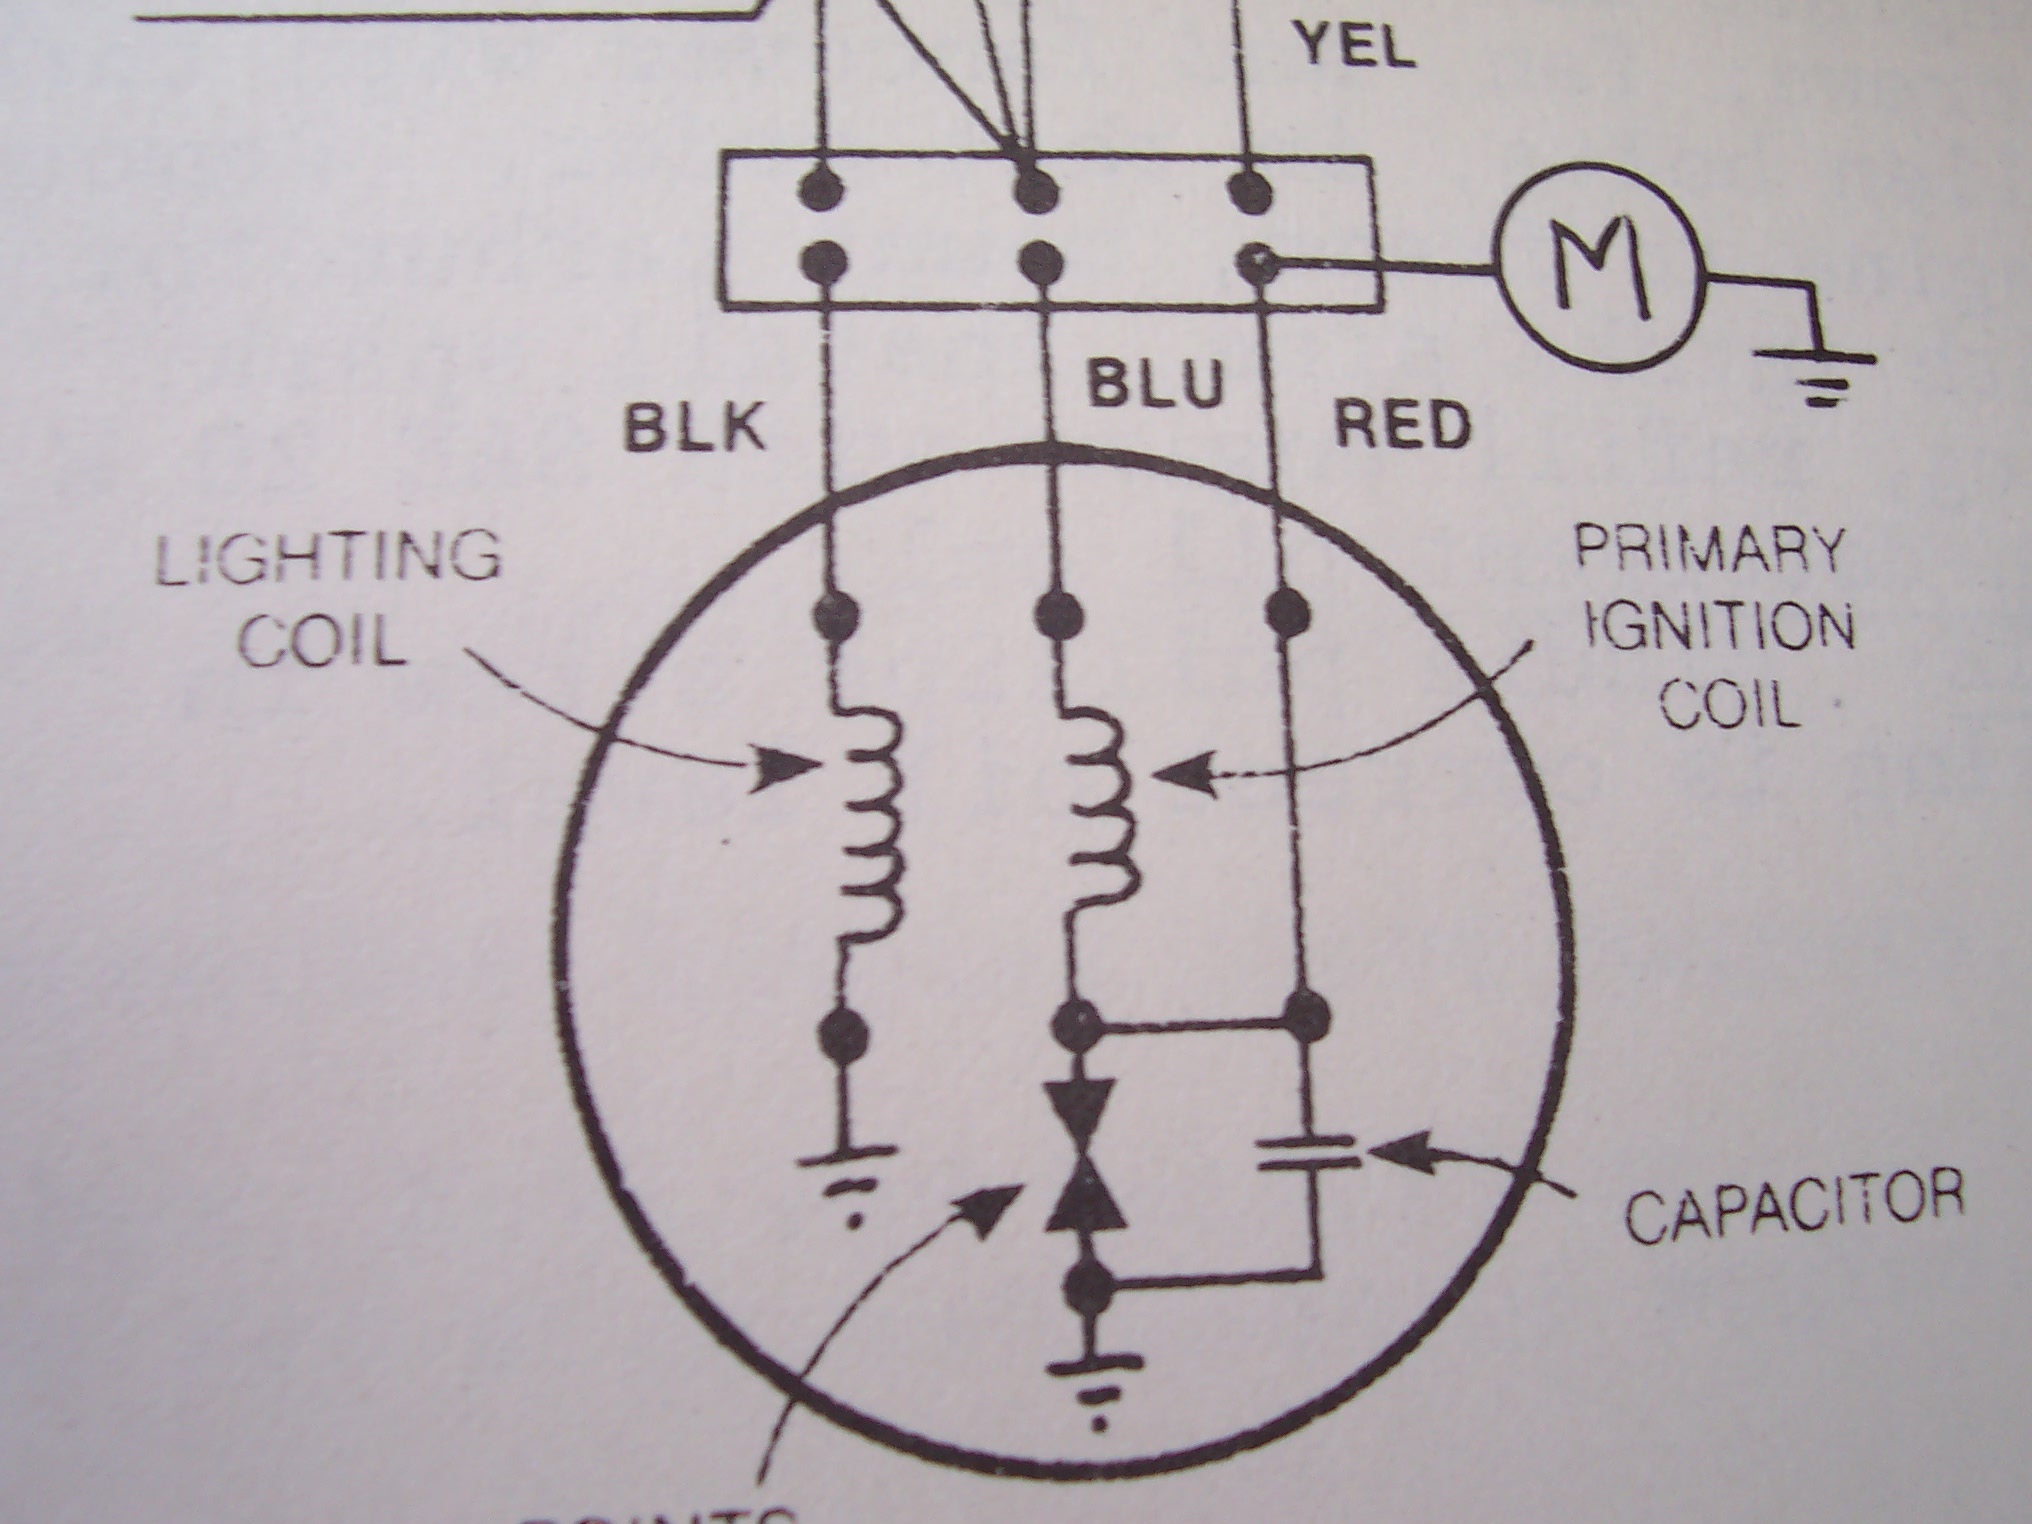 Minarelli V1 Schematics (Wiring Diagram) — Moped Army